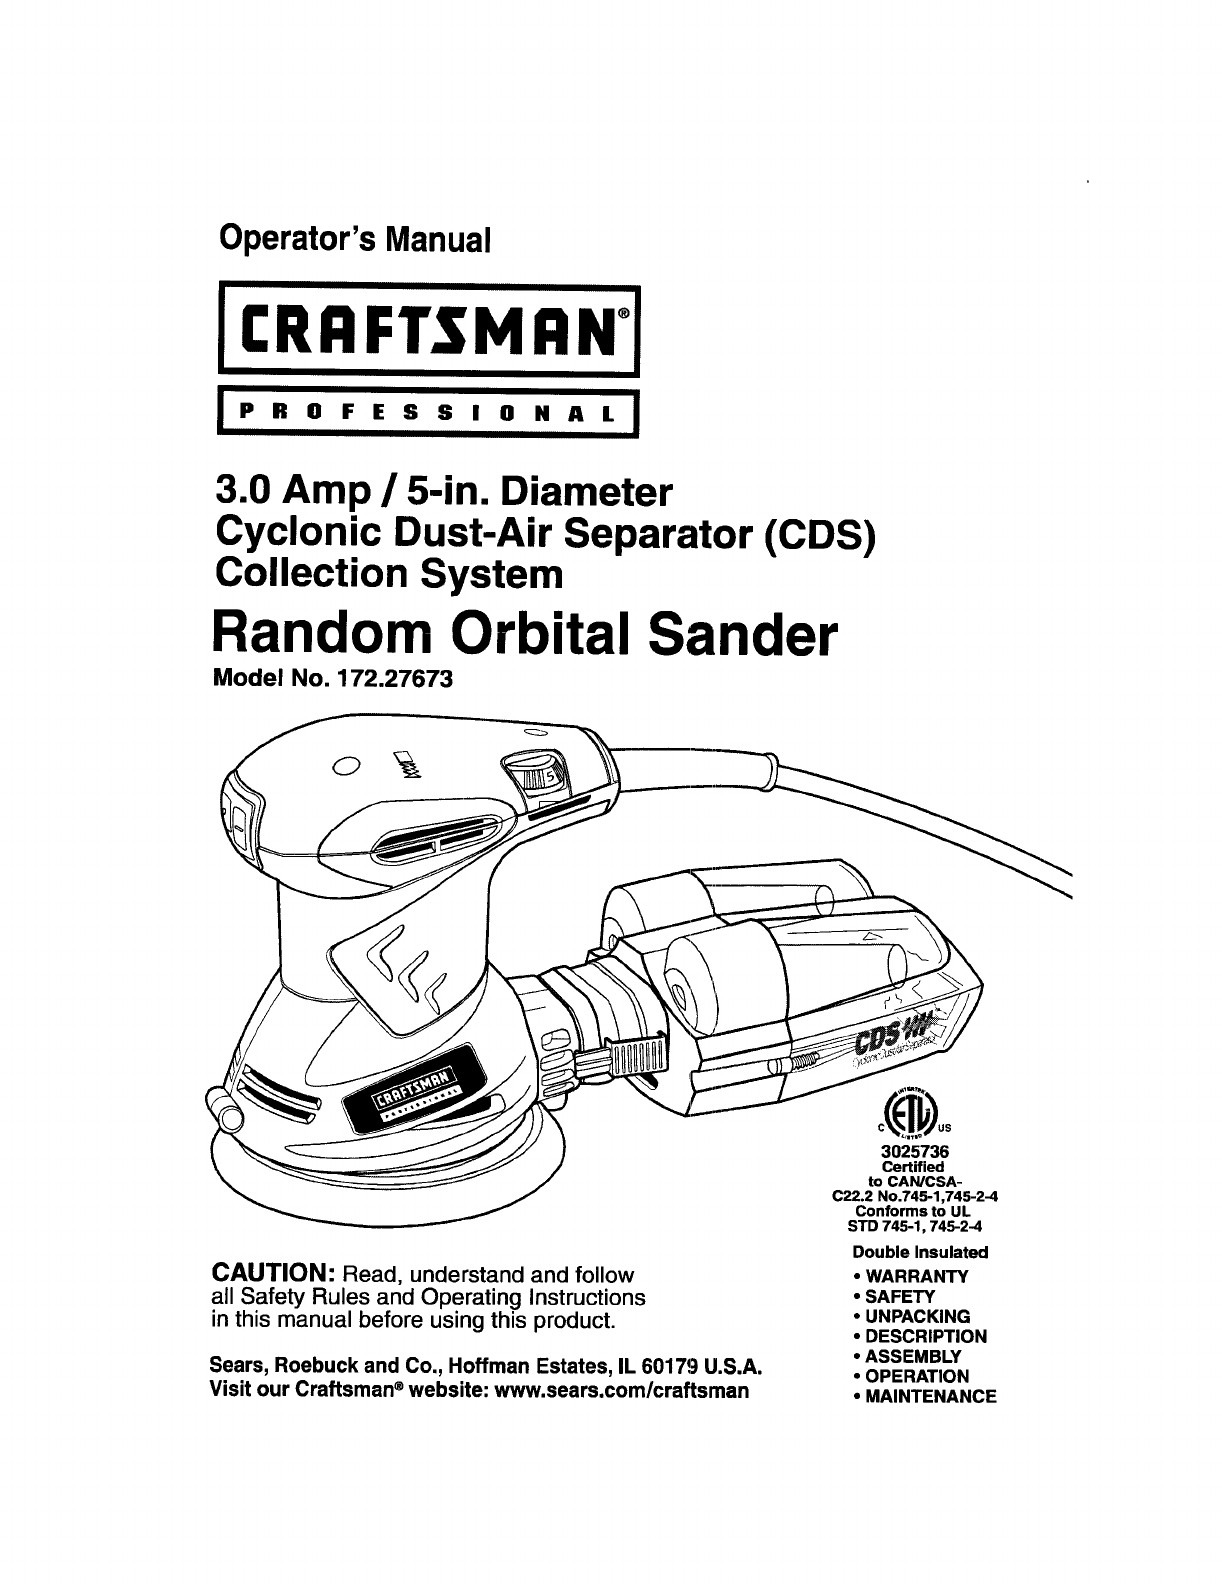 Craftsman 17227673 User Manual SANDER Manuals And Guides